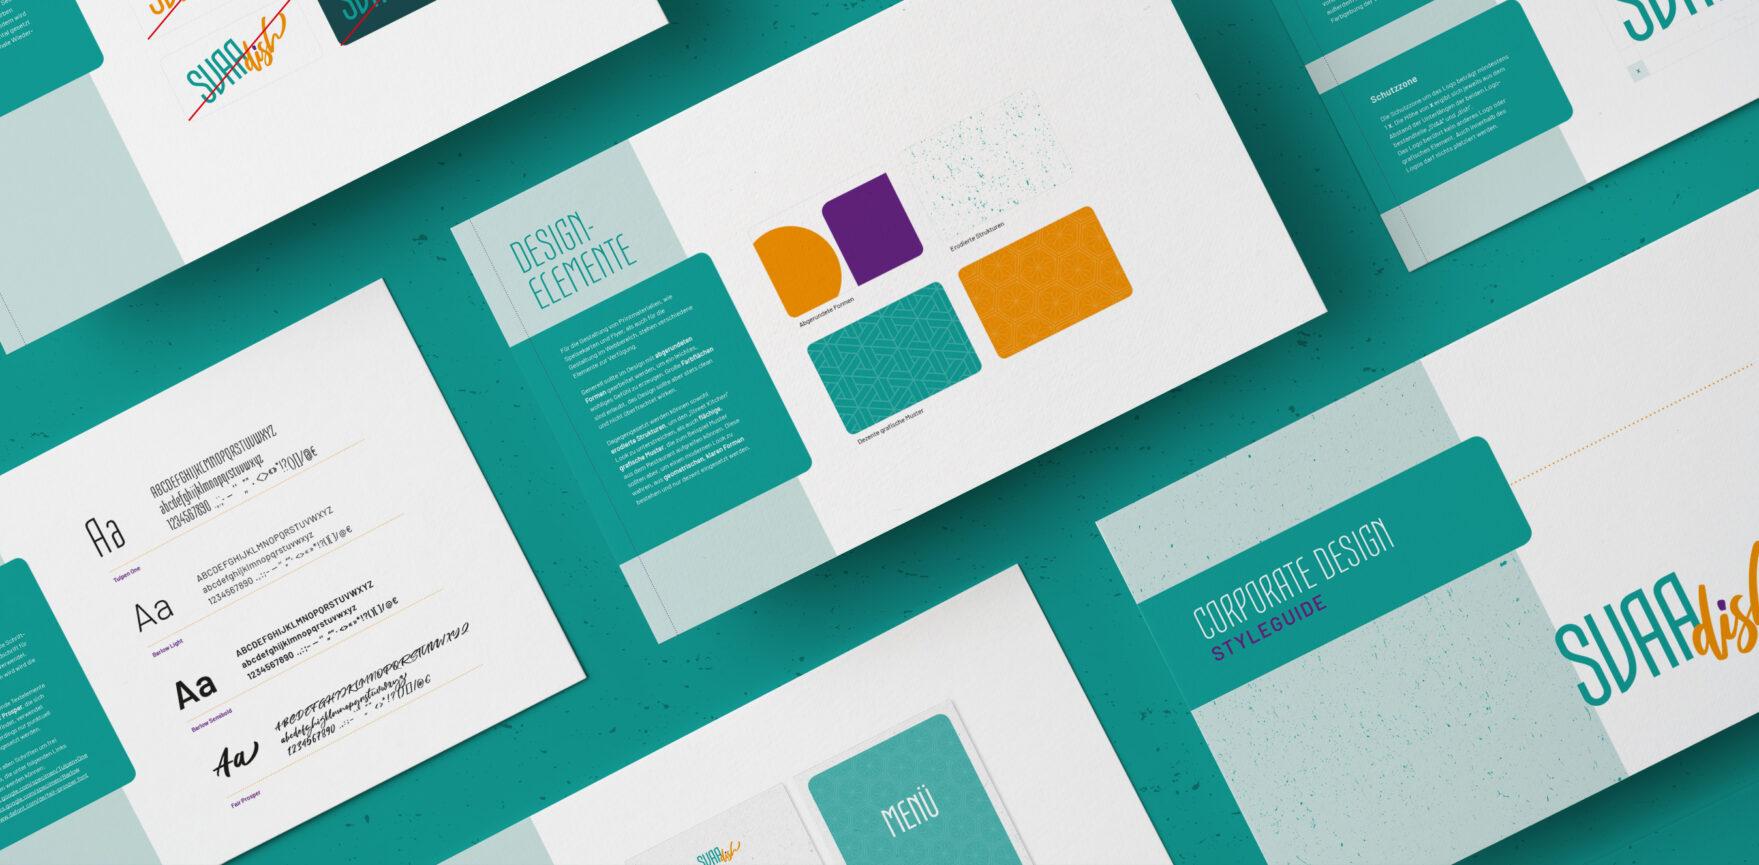 SVAAdish Coporate Design Manual